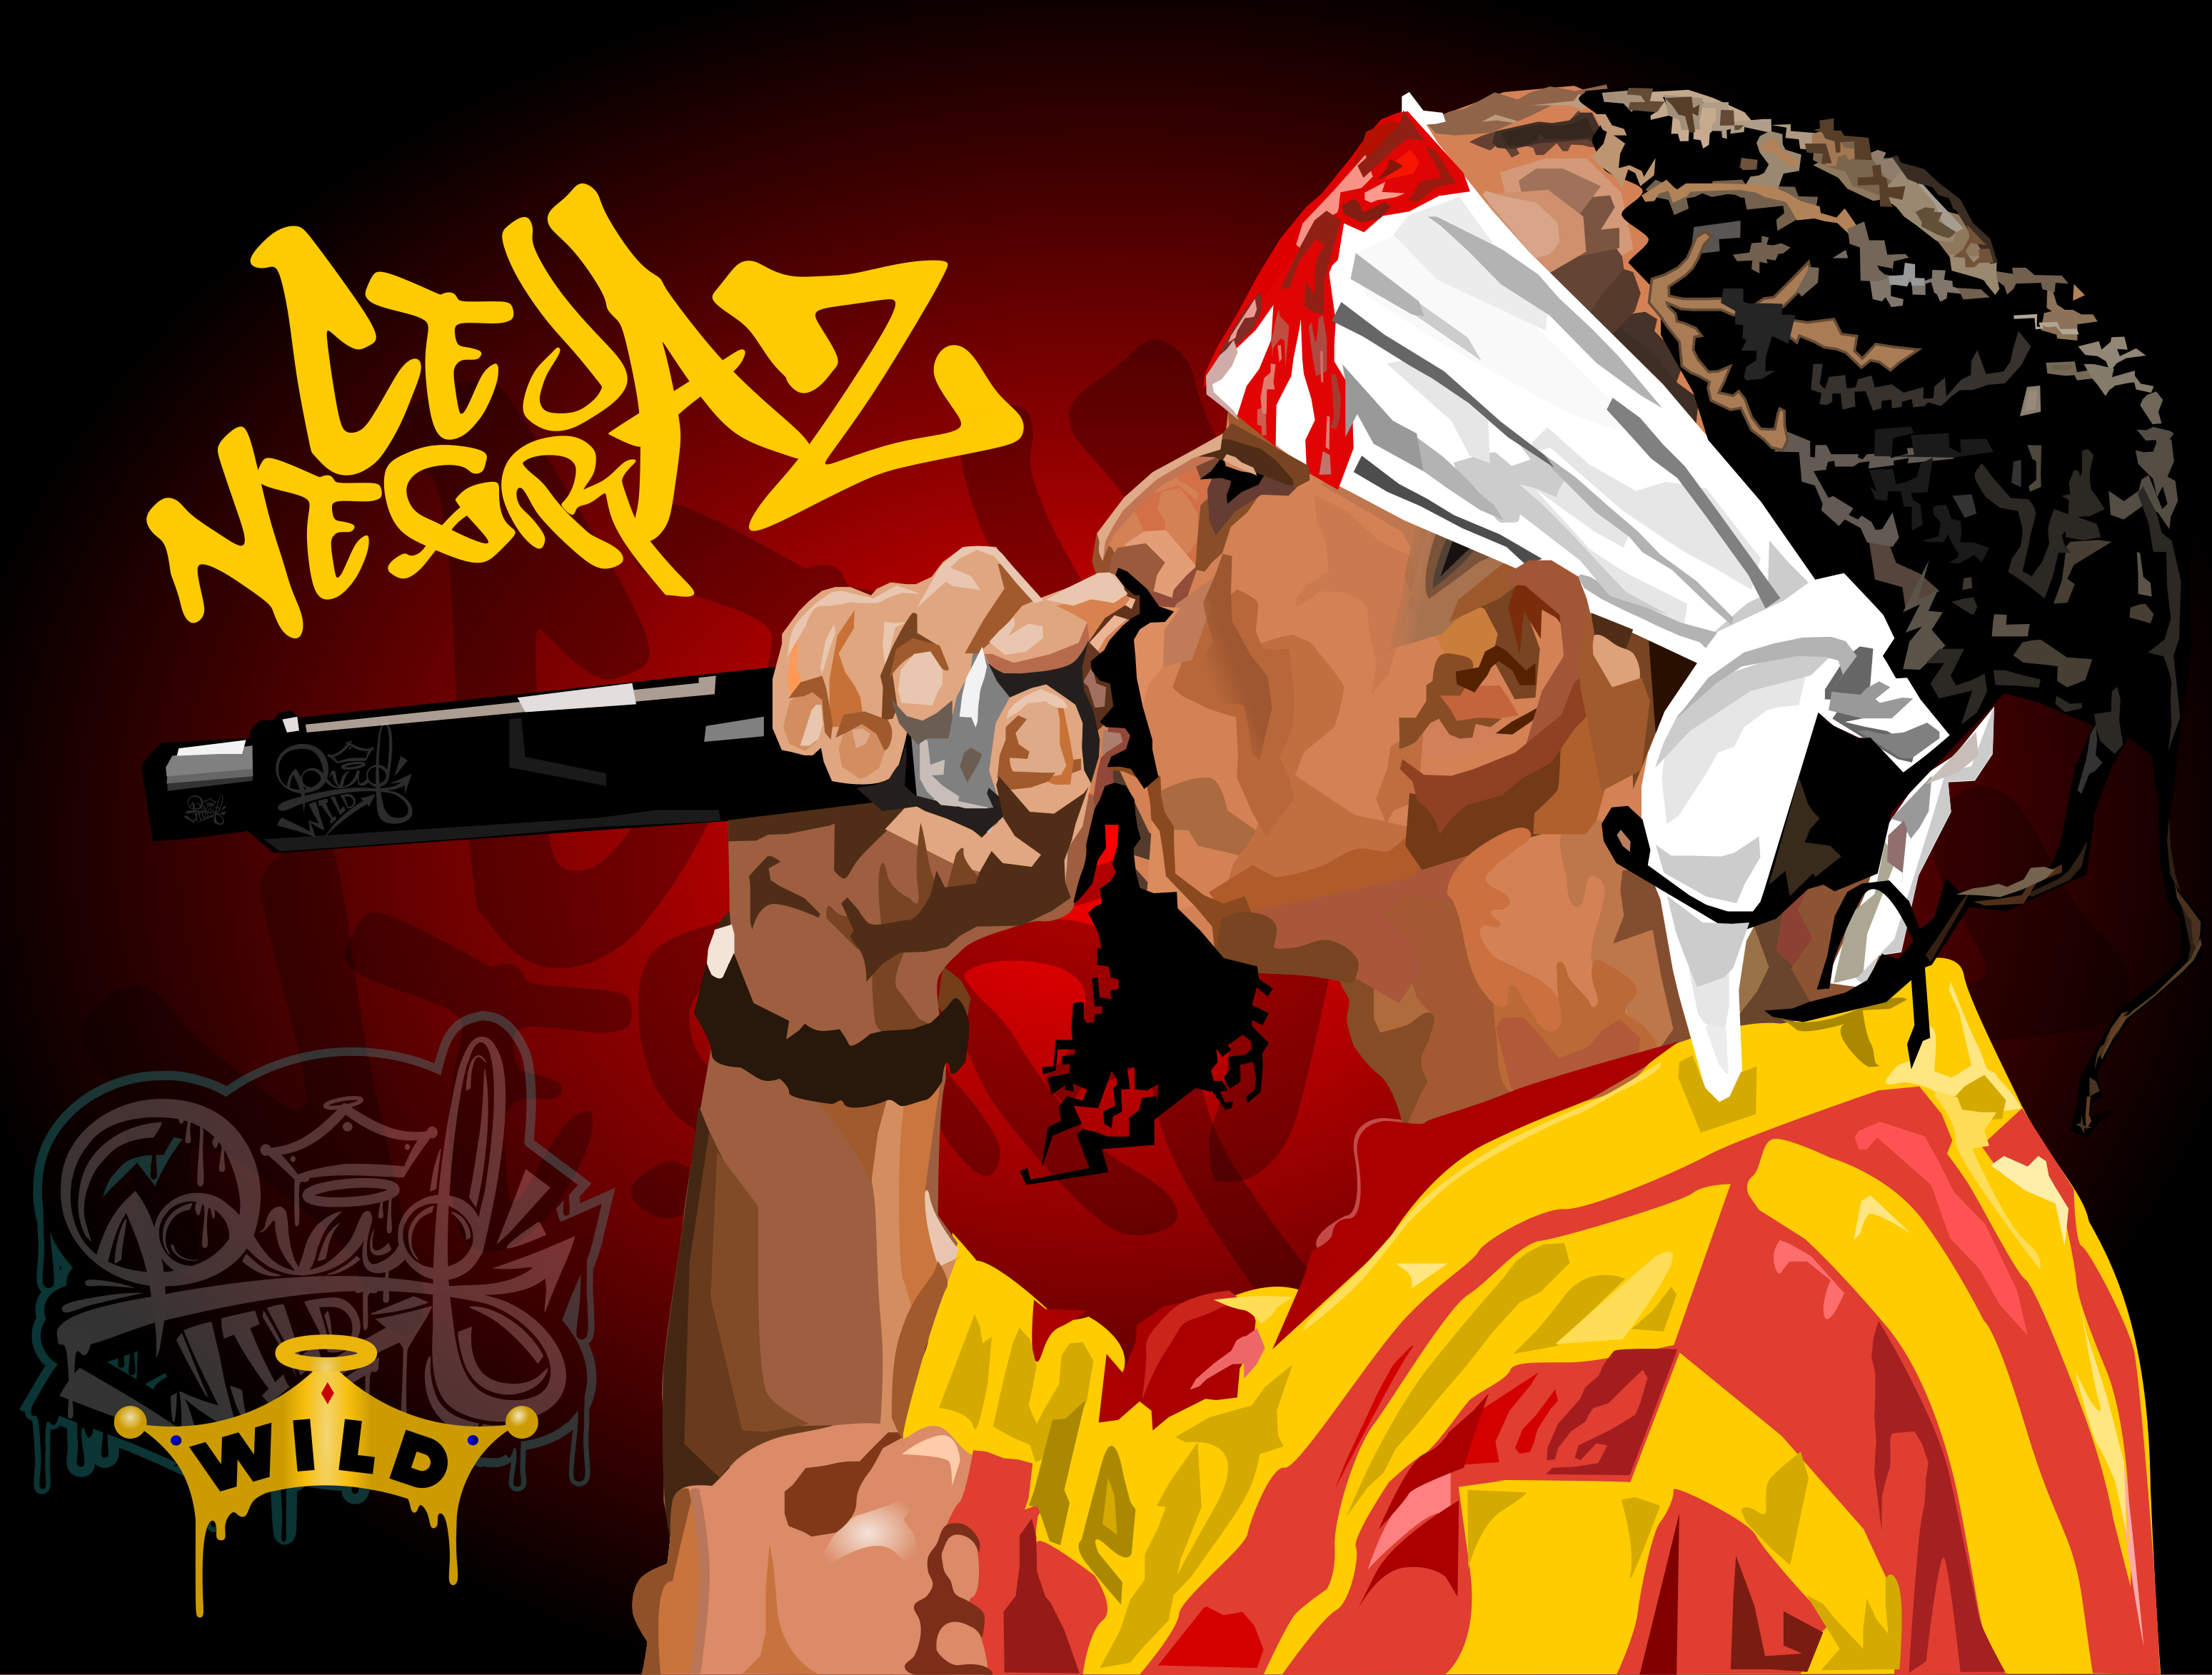 Ilustracion vectorial cejaz negraz rapero colombiano integrante de la agrupacion crack family by: #davidstivenwild #wild